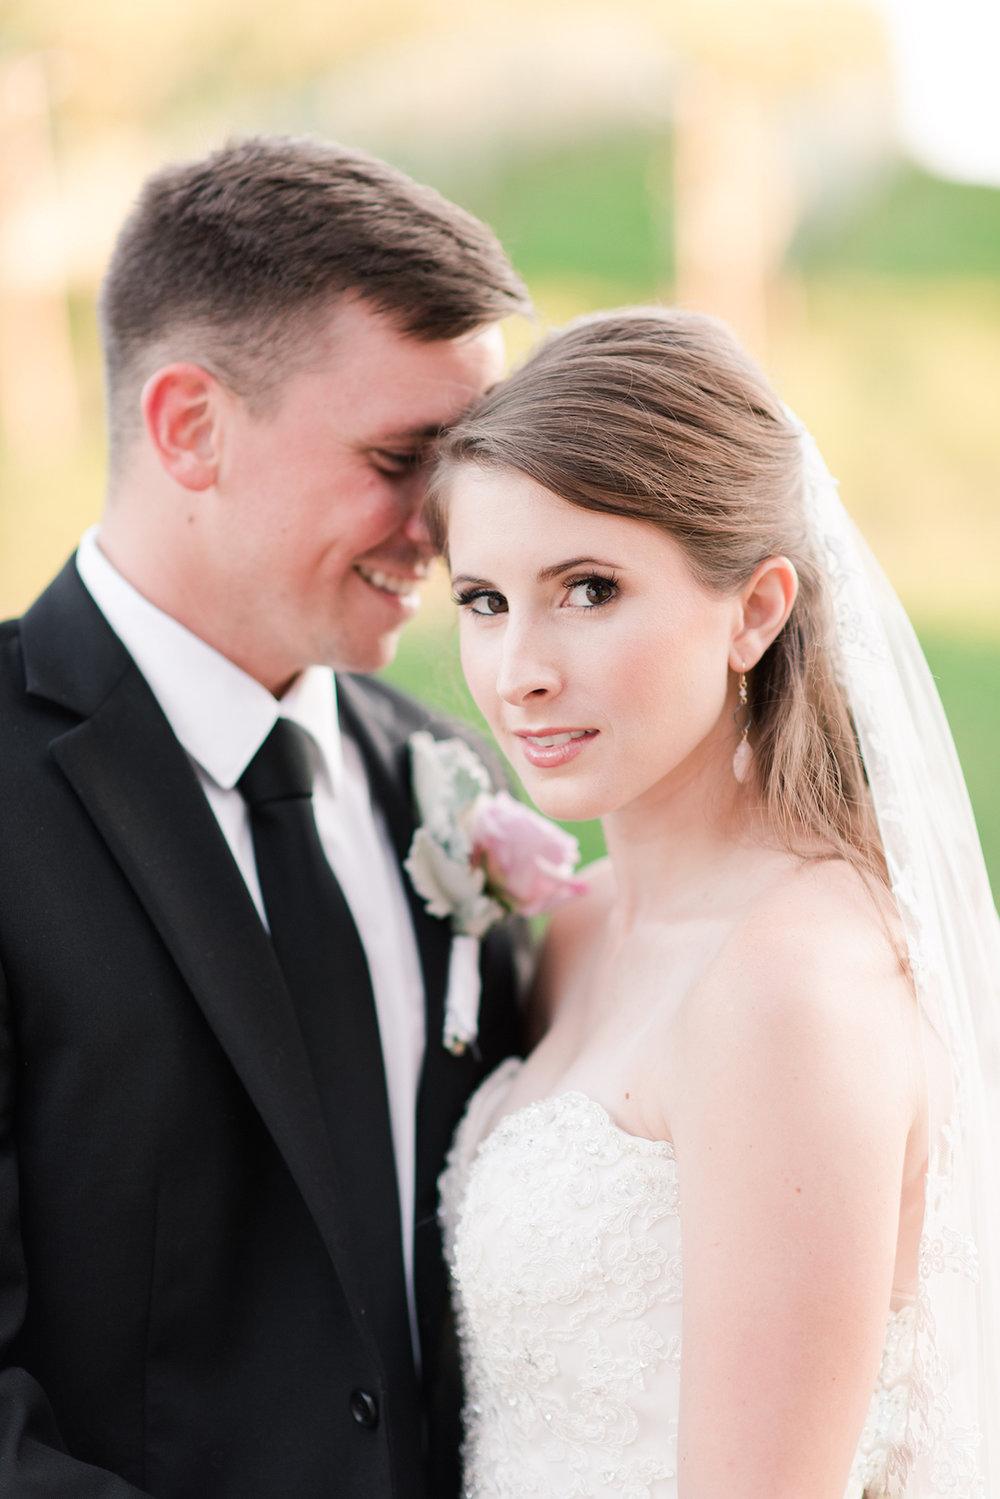 dc-northern-virginia-timeless-elegant-photojournalism-wedding-photographer-emily-alyssa-photo